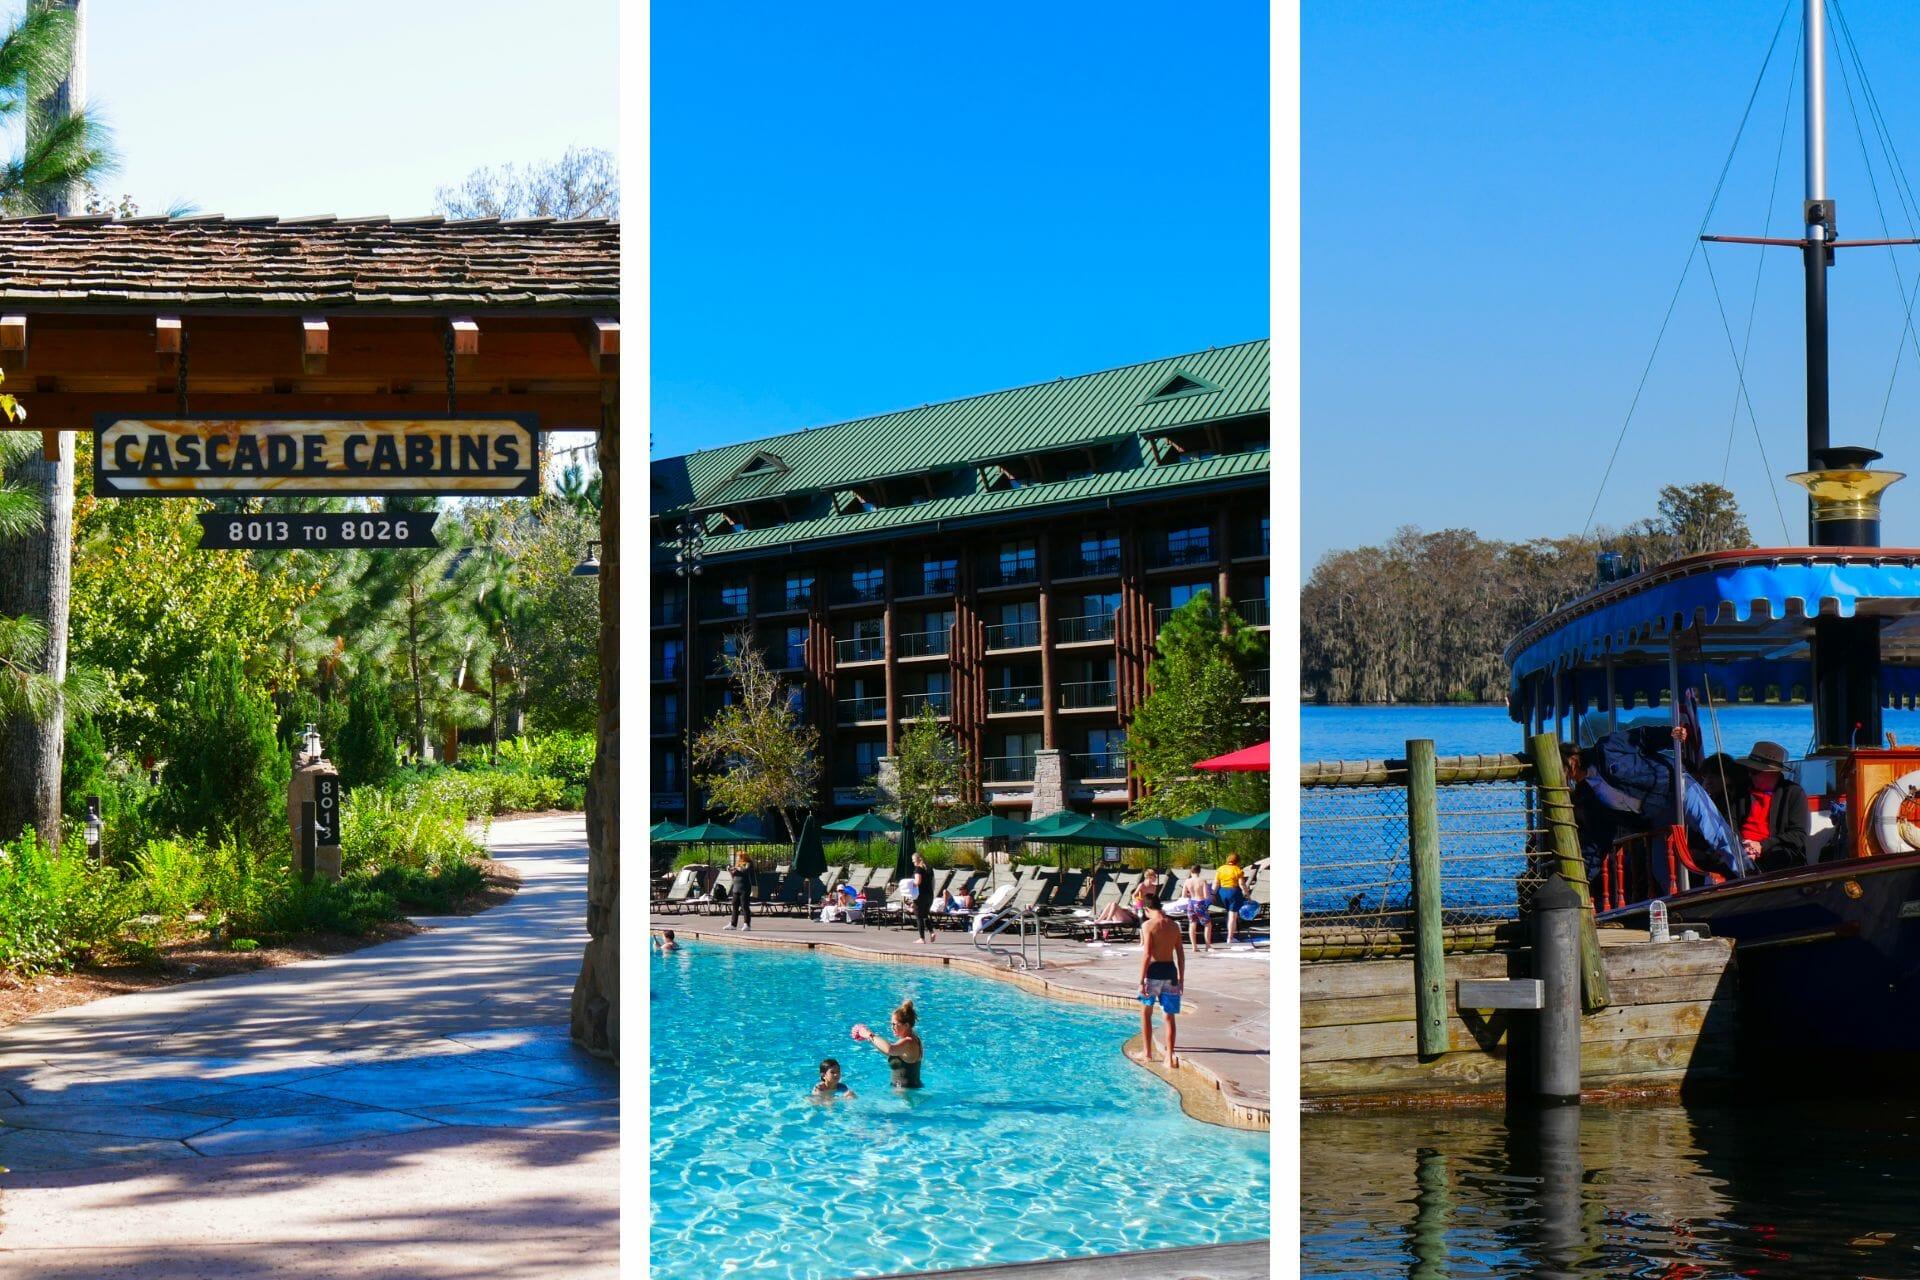 Honest Disney's Wilderness Lodge Review 2021 (+ Tons of Pictures) via @allamericanatlas